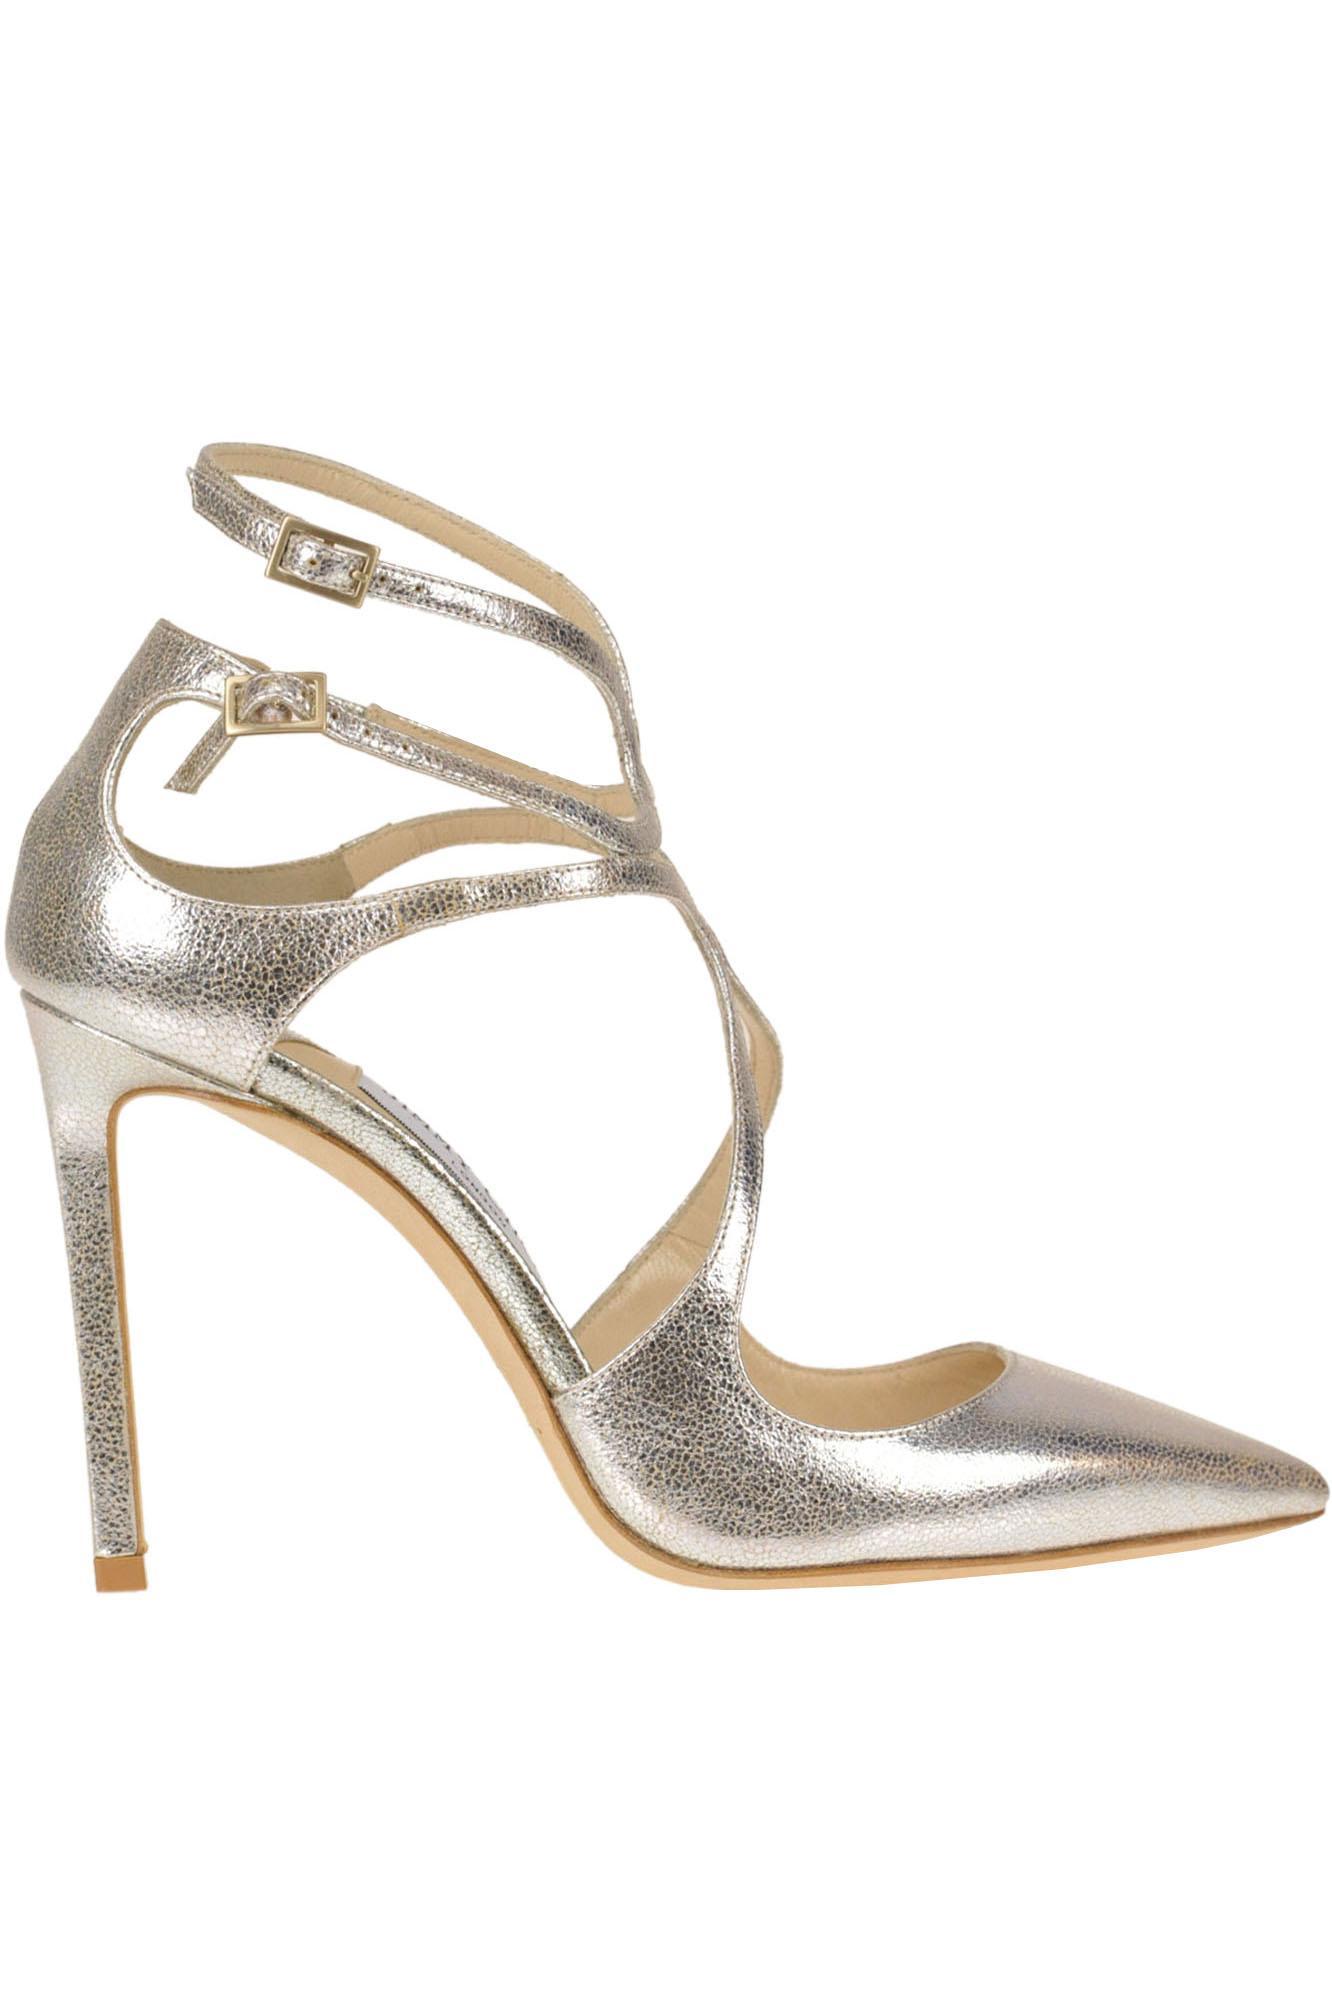 4676fbafe15d Jimmy Choo. Women s Metallic  lancer  Court Shoes